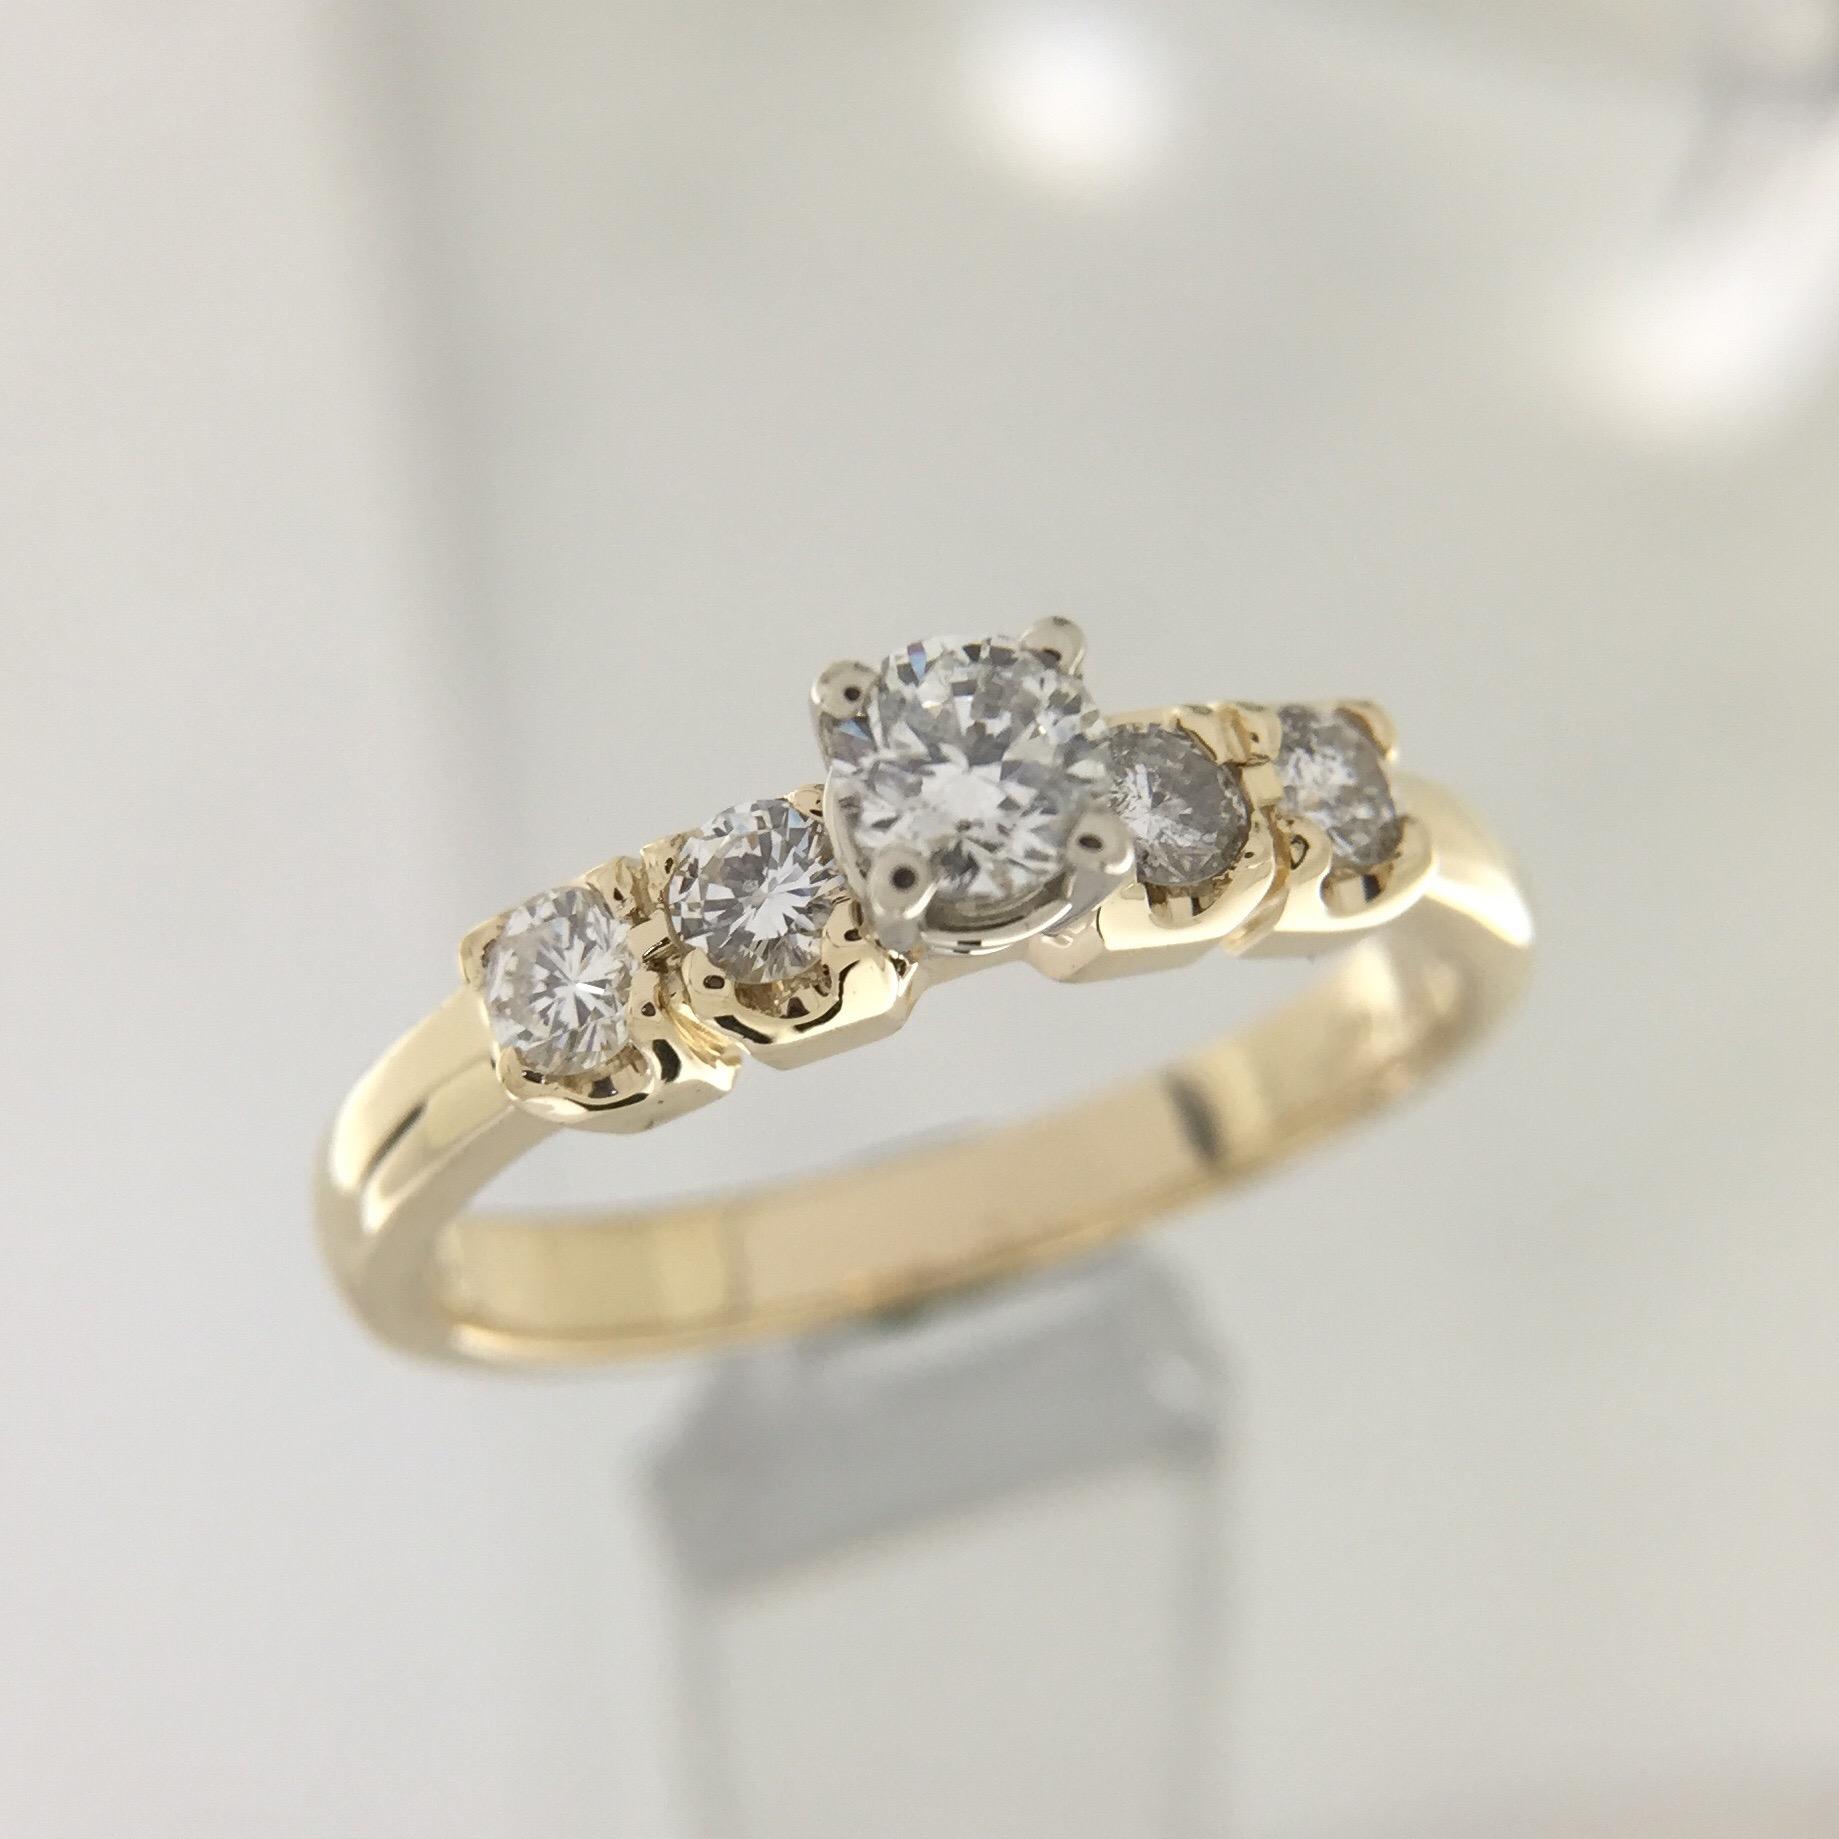 izyaschnye wedding rings redo your wedding ring With redoing wedding rings